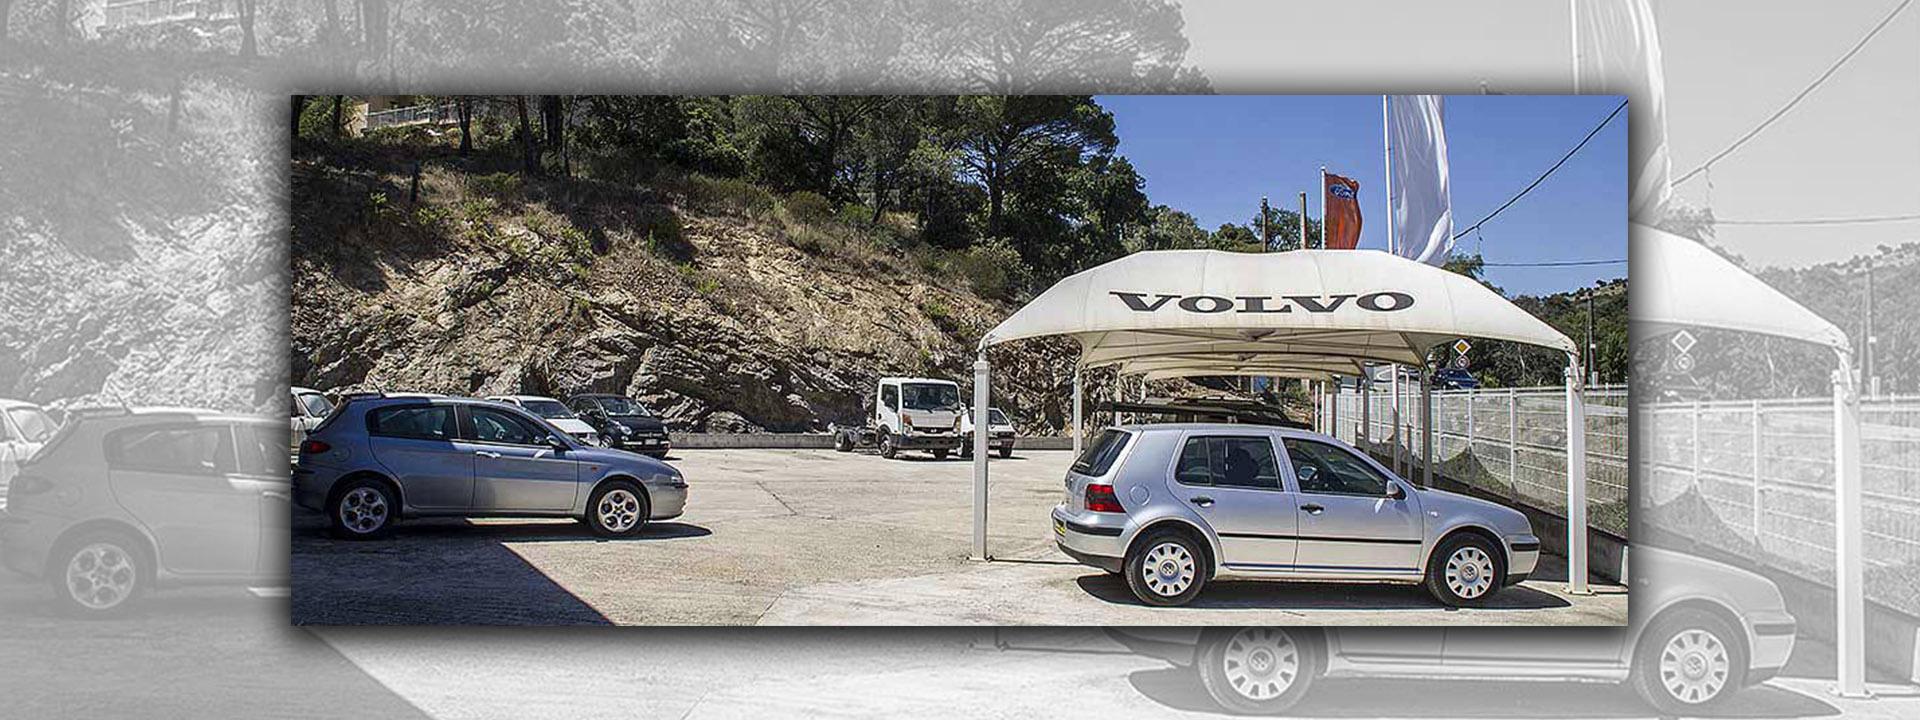 Garage Carrosserie Automobile Gibbese Sainte Maxime Plan De La